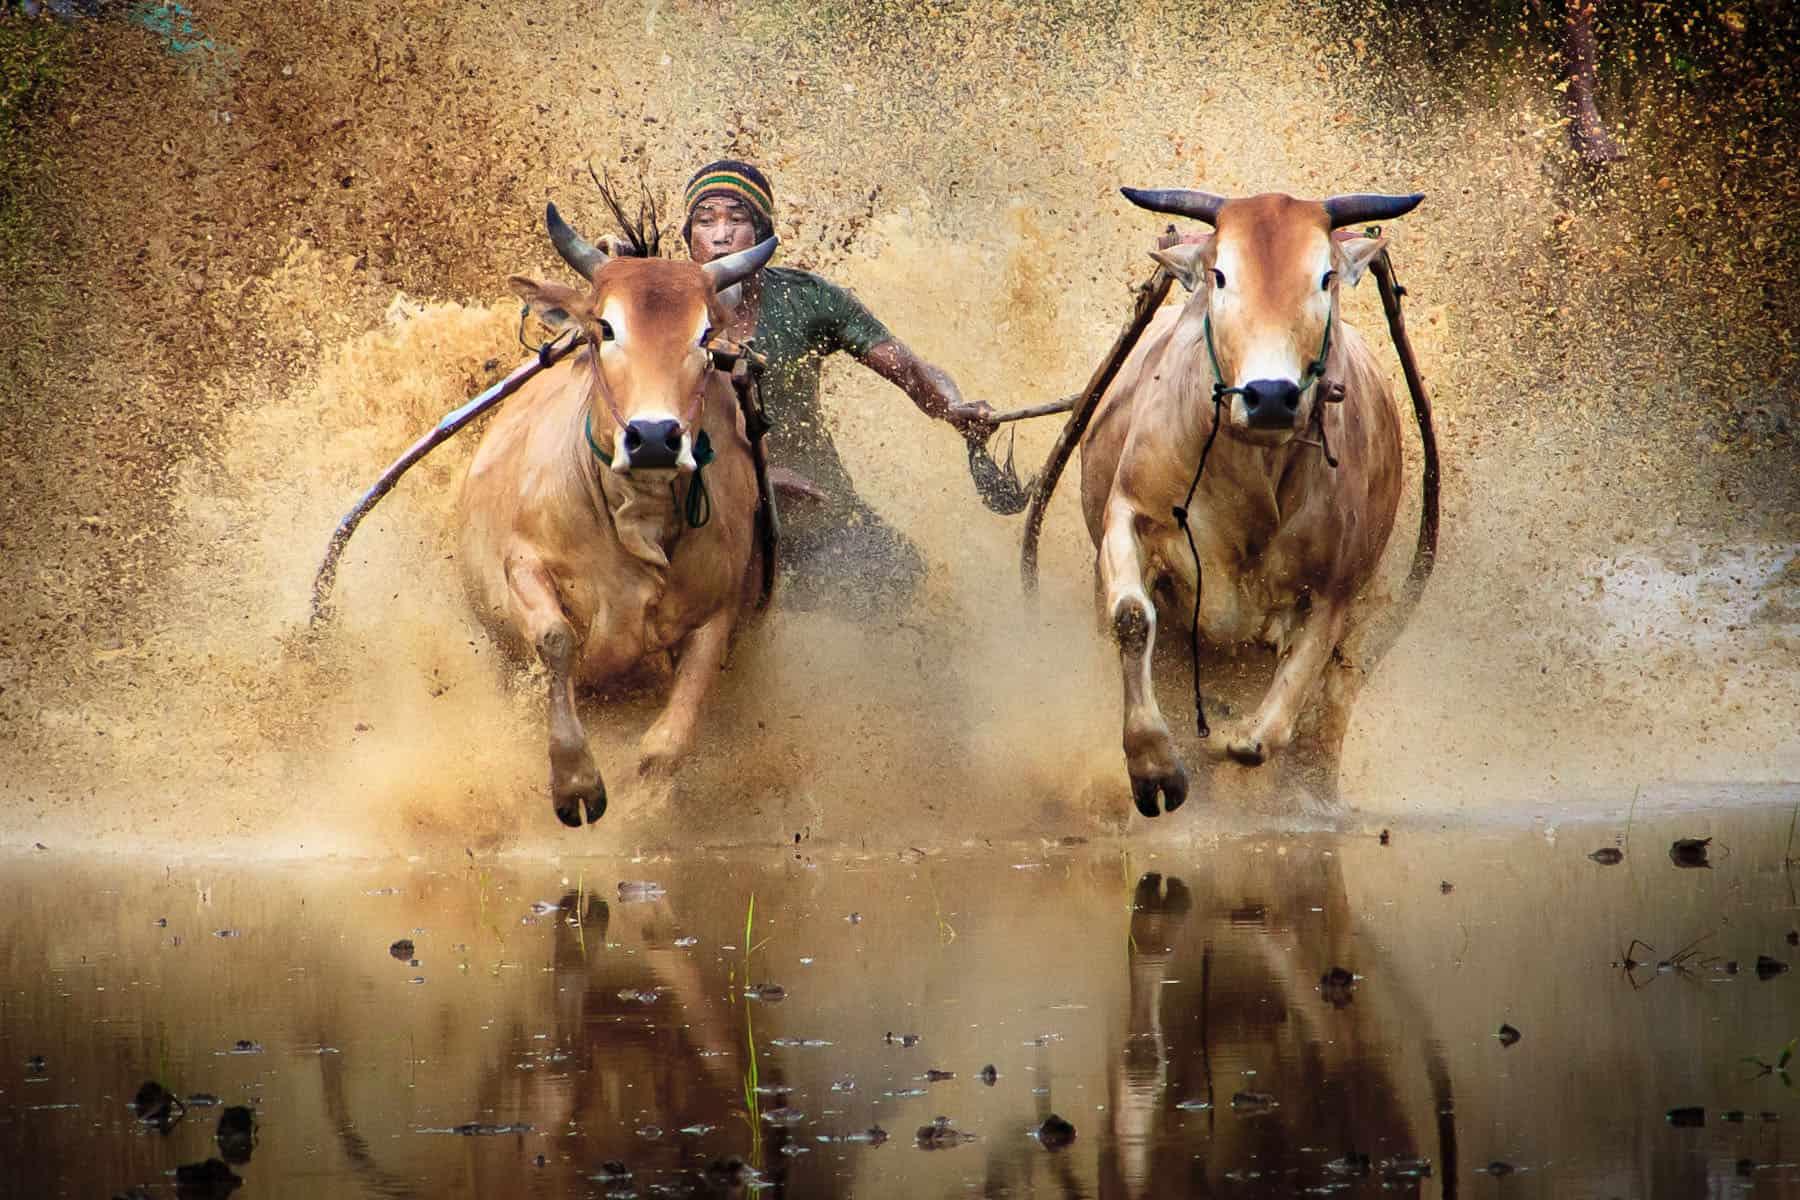 Buffalo racing on Bali, Indonesia